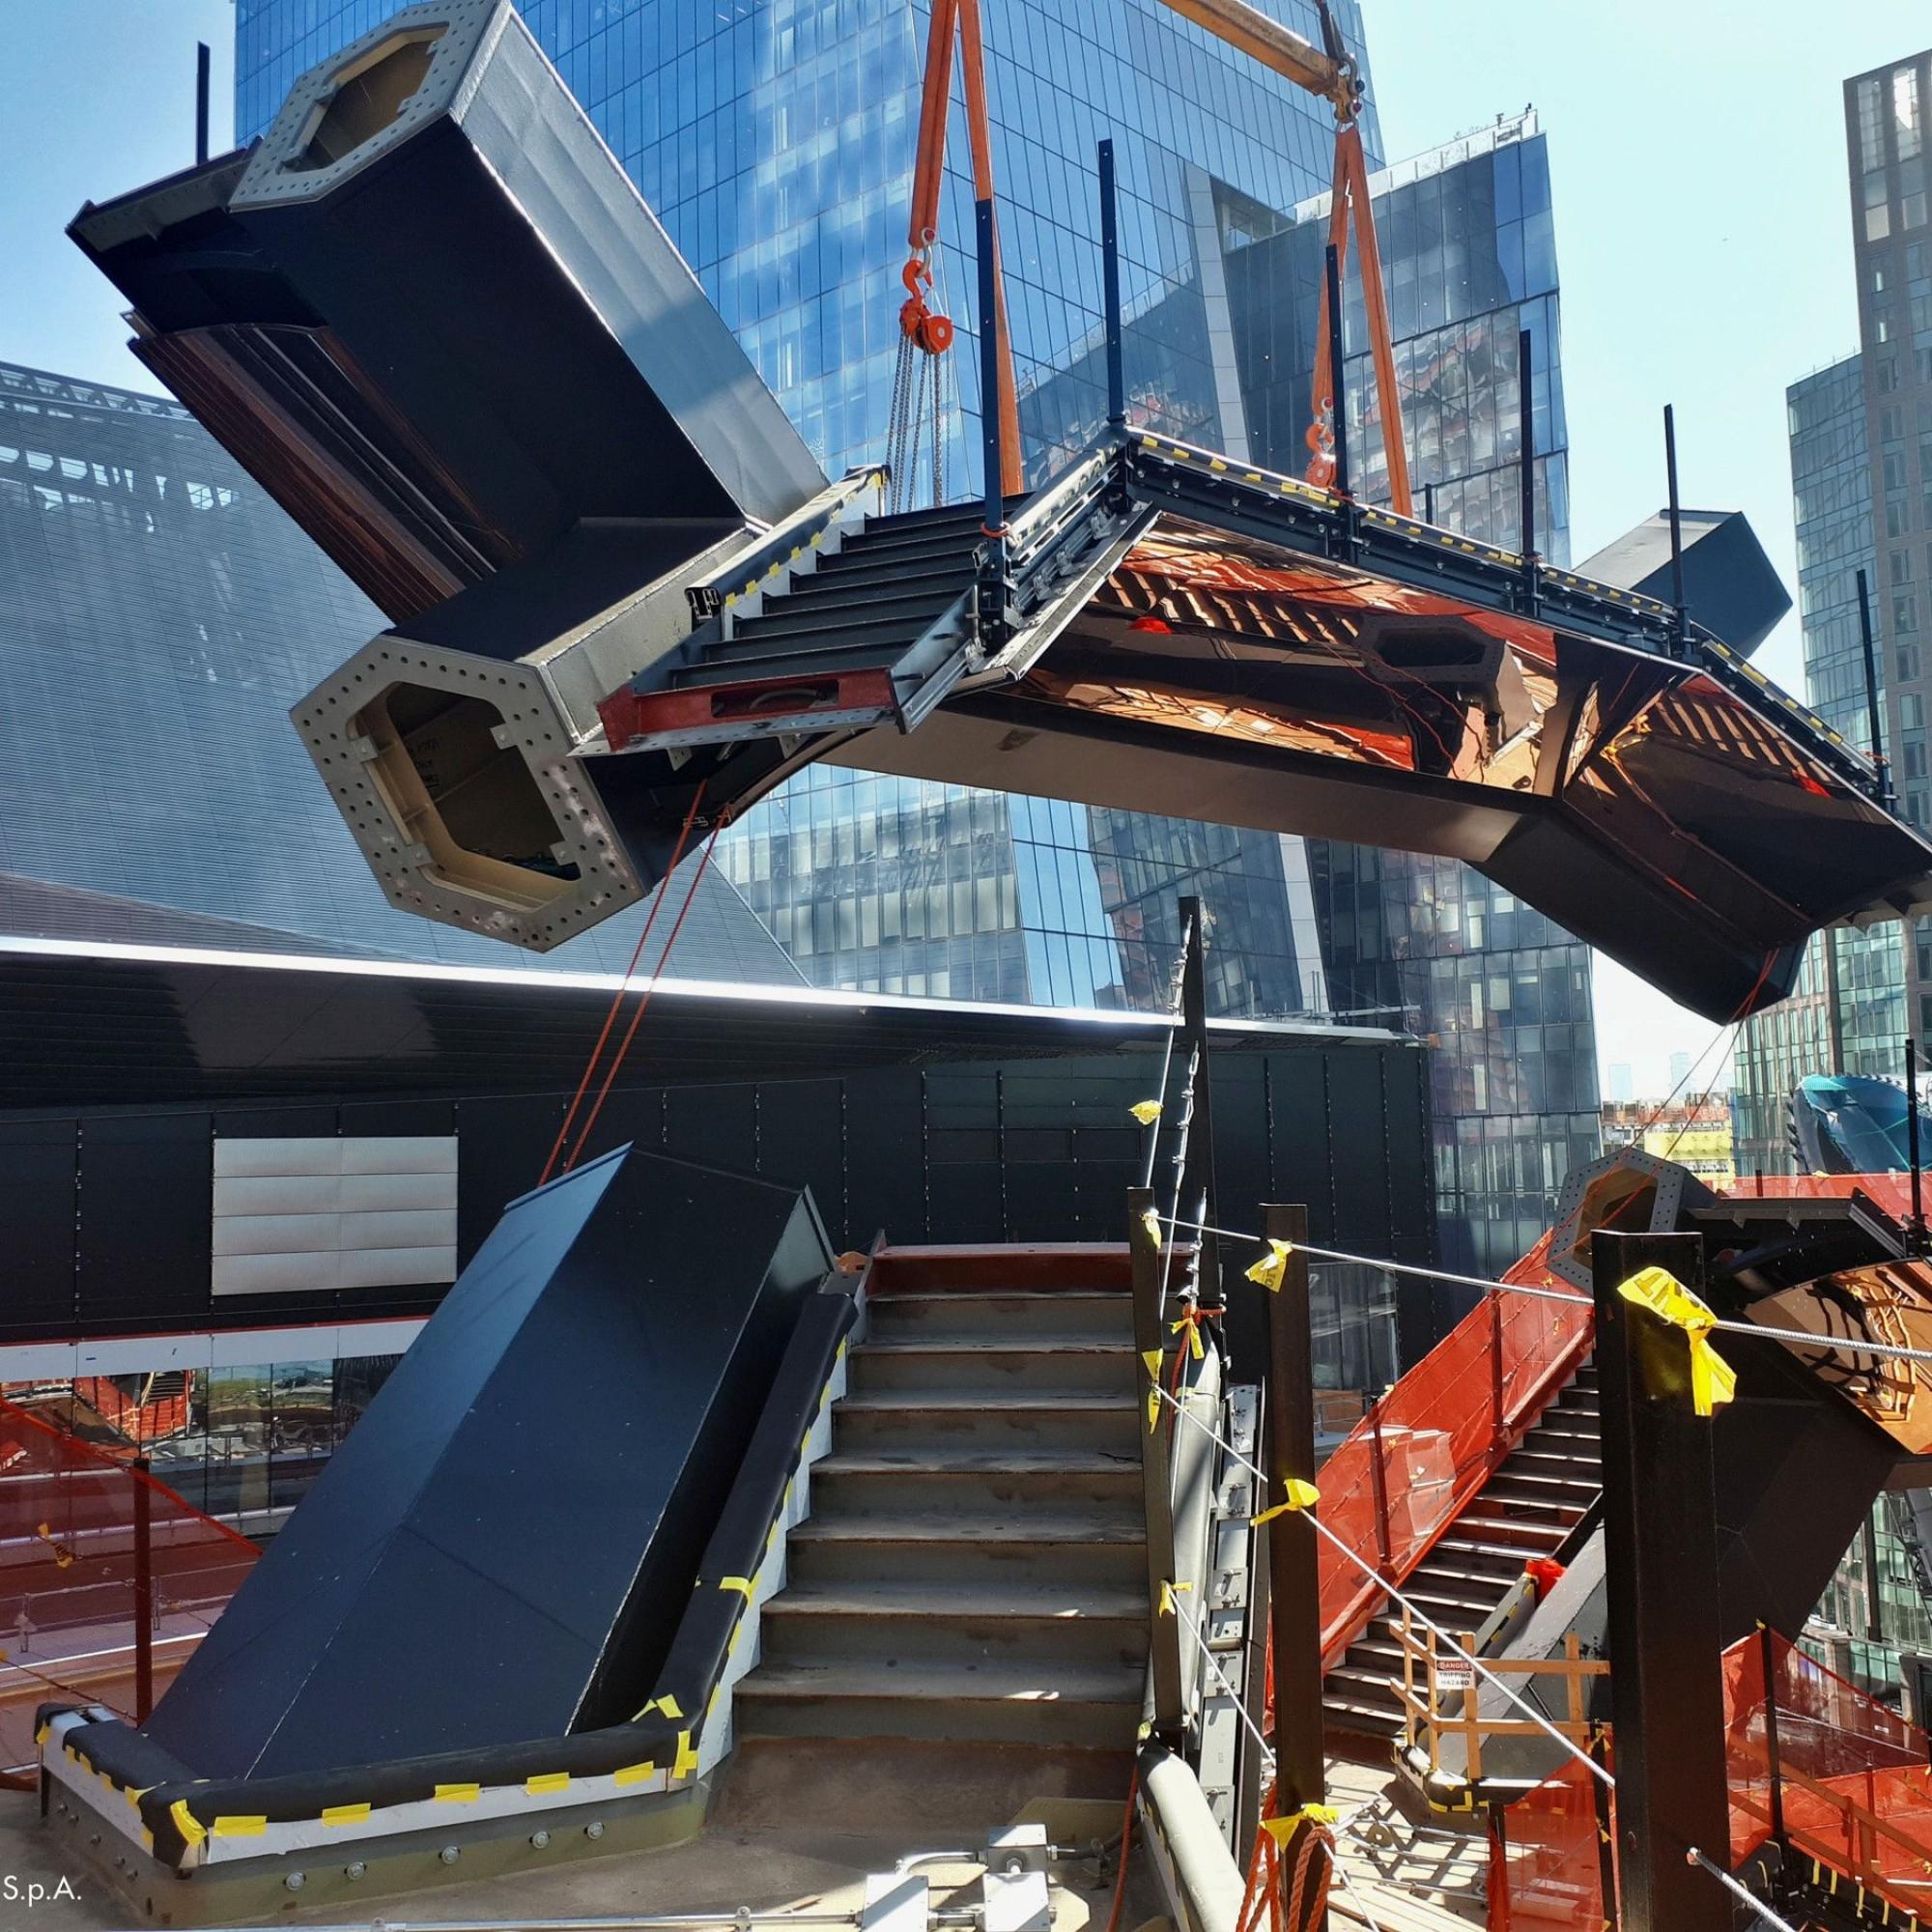 The Vessel in New York